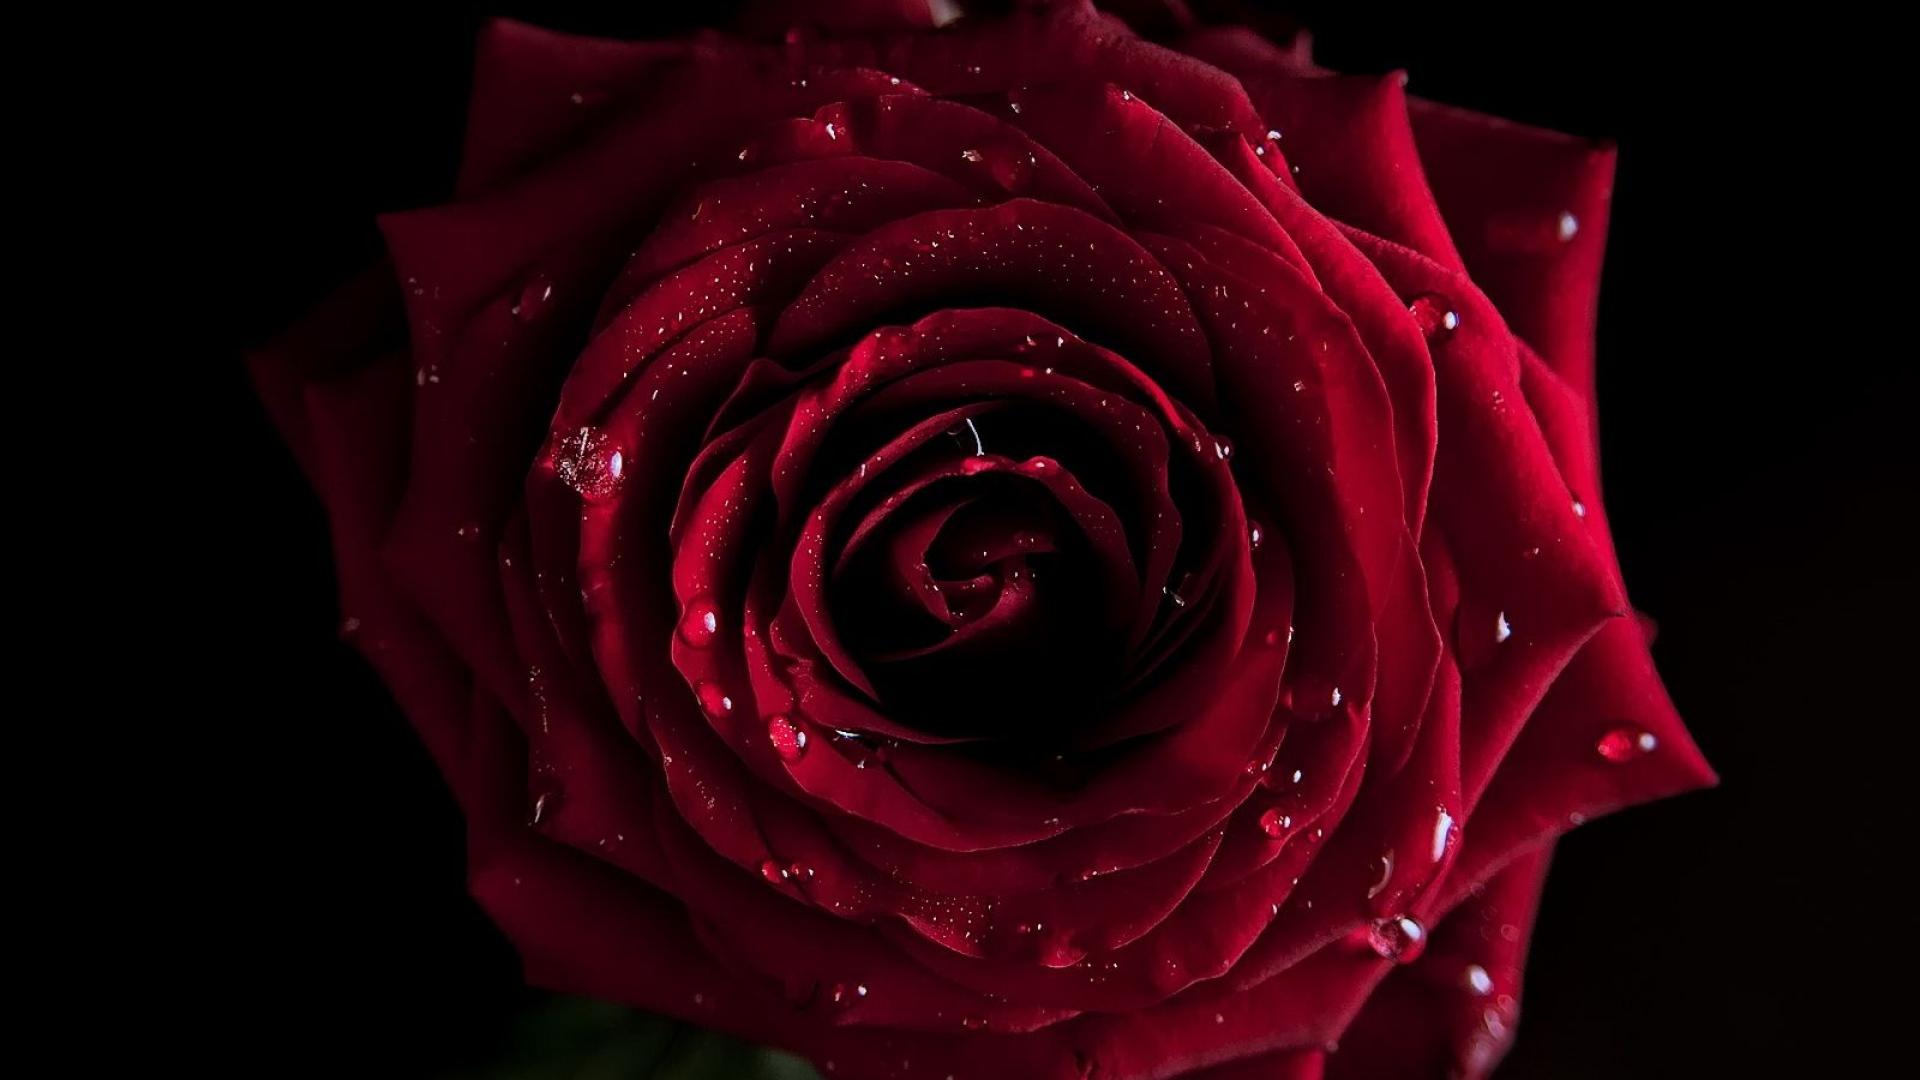 Red Rose Background Black 1920x1080 Download Hd Wallpaper Wallpapertip